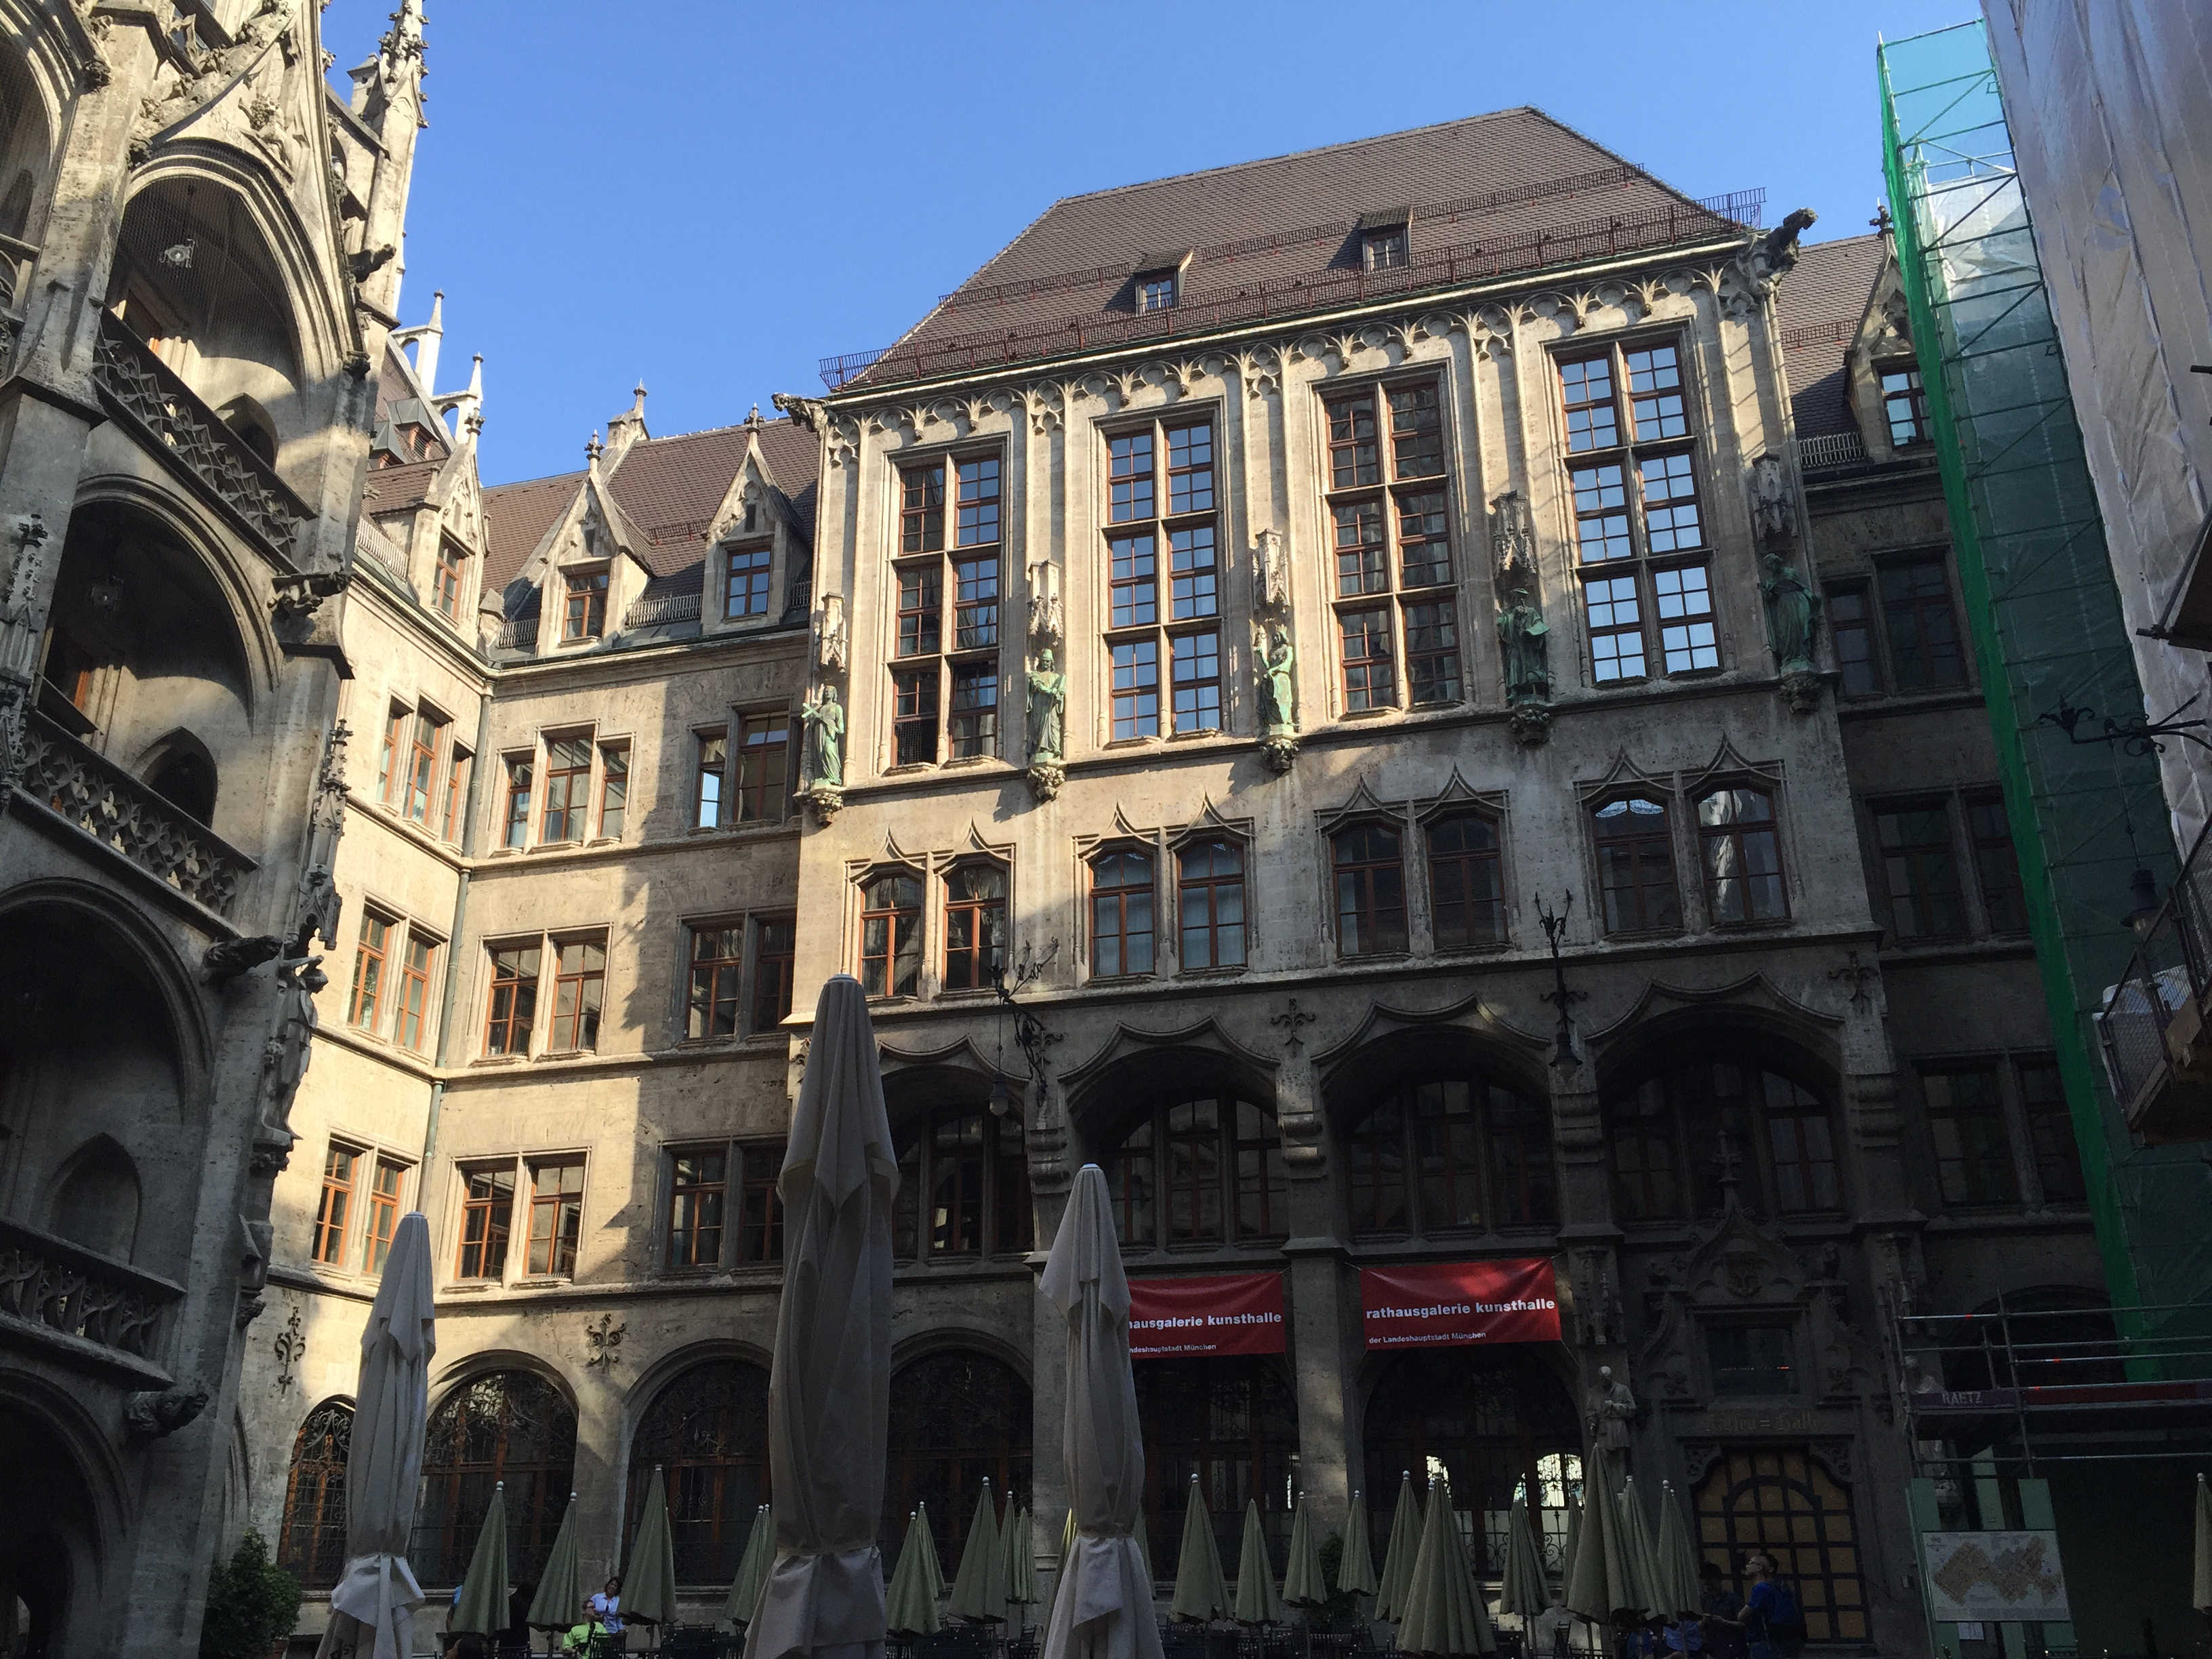 neues rathaus, munchen, germany, deutschland, mnichov, roadtrip, travel, cestovanie, bmw spat ku korenom, tonychef, tony dubravec